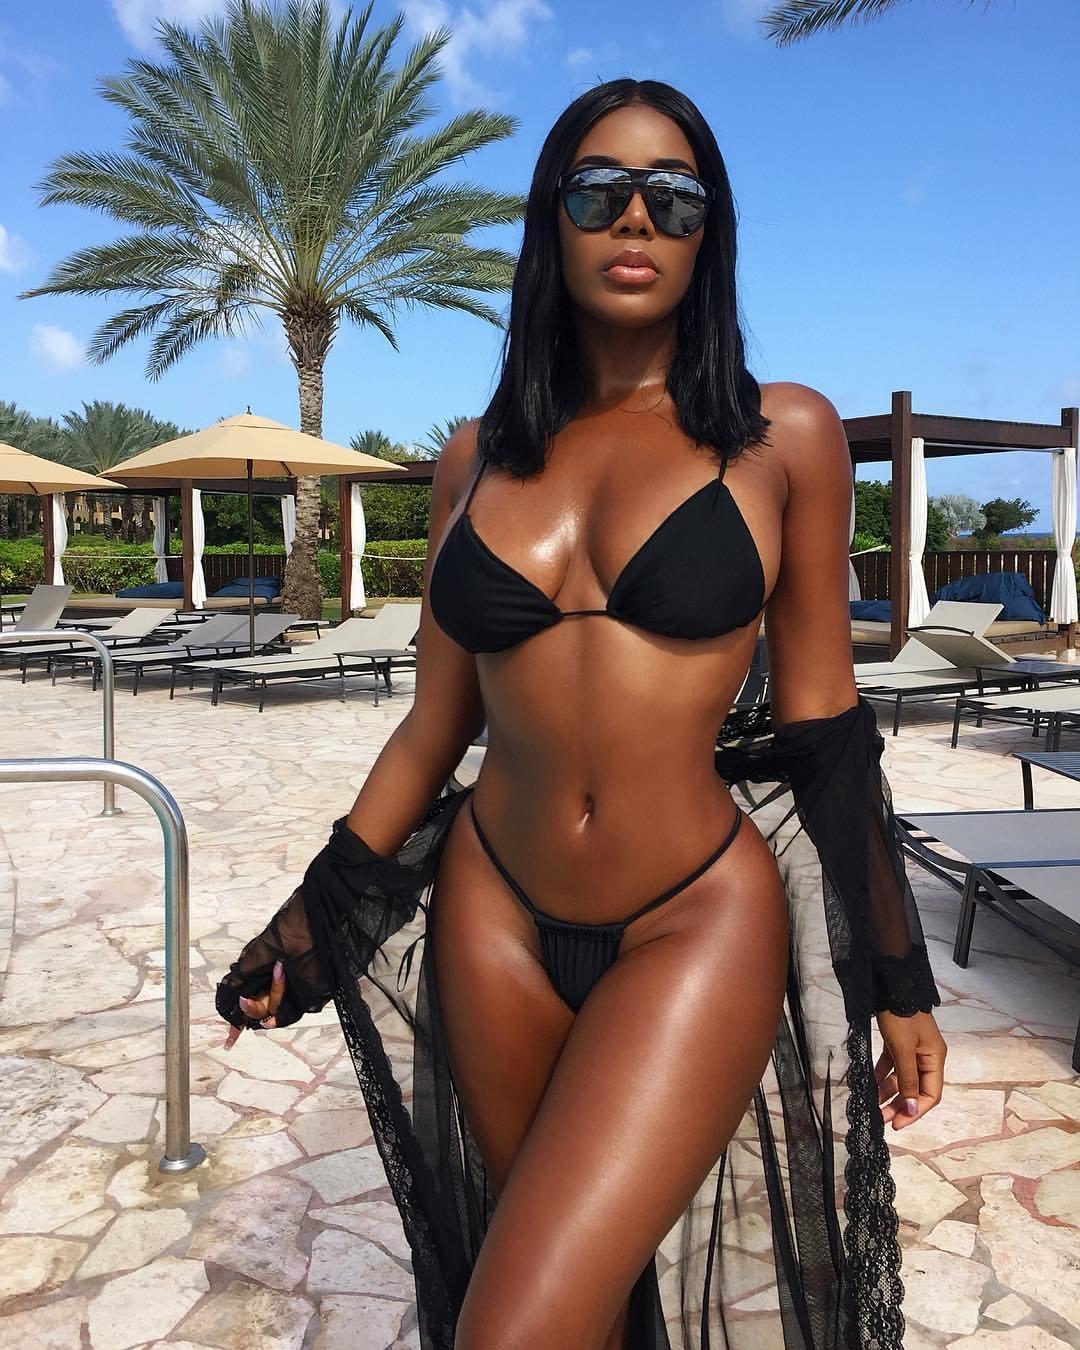 Black Girl Bikini Pics